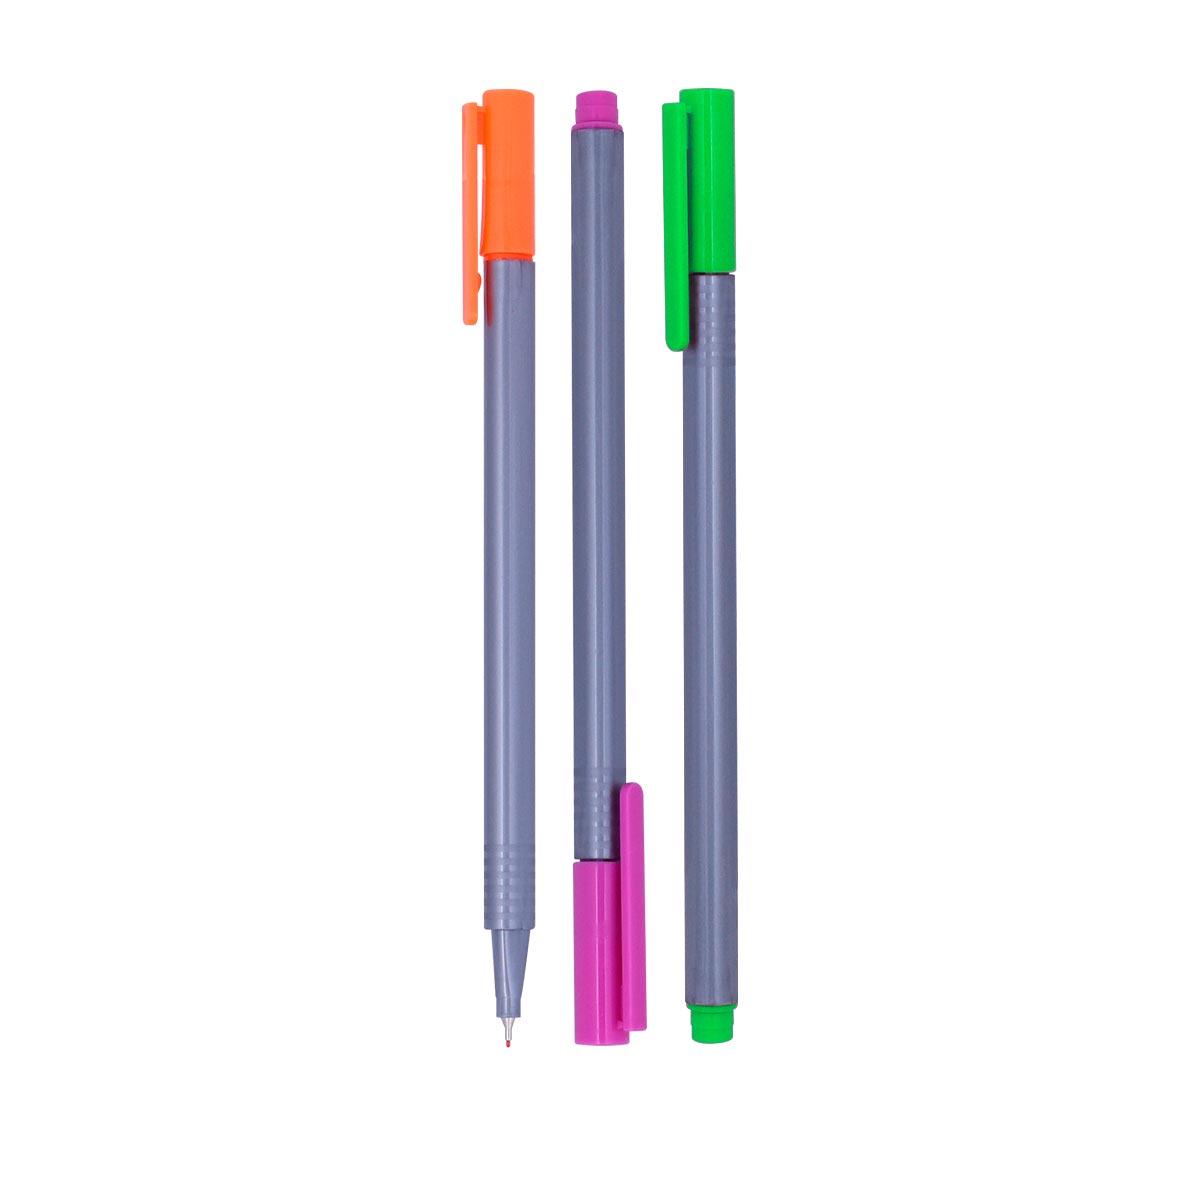 طقم الوان مائيه 12 لون رقم YM-21108